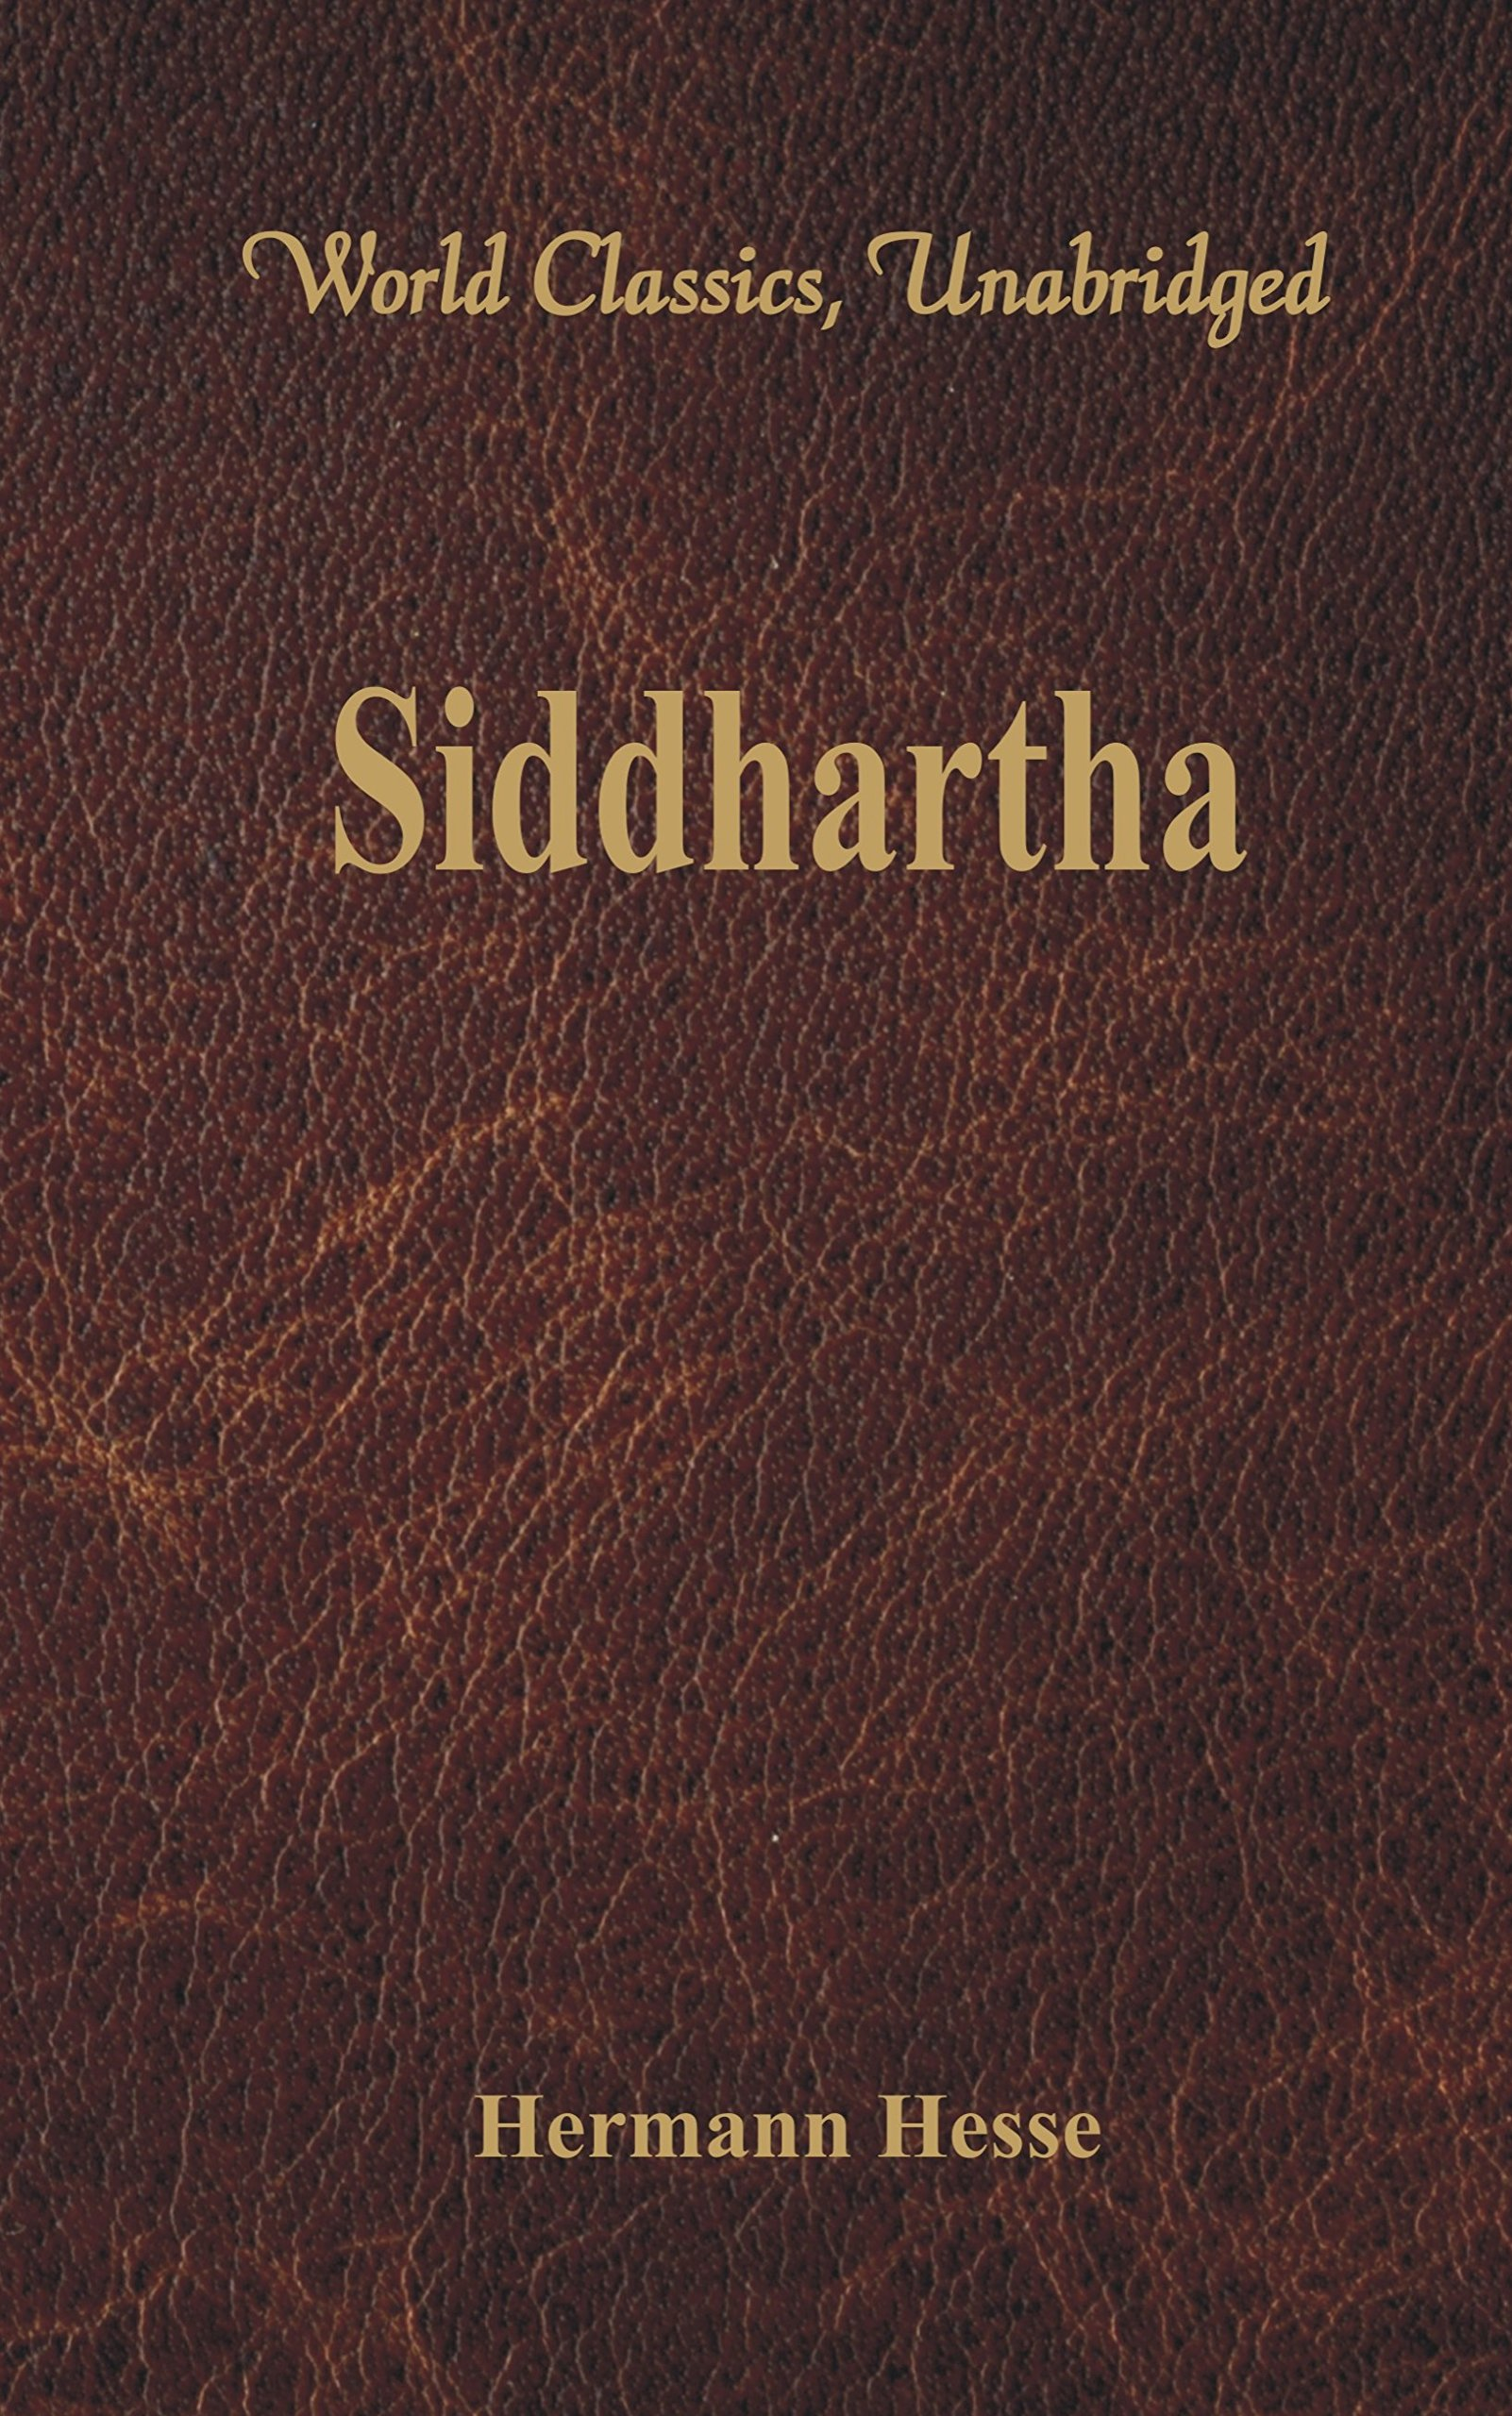 Siddhartha  World Classics Unabridged   English Edition